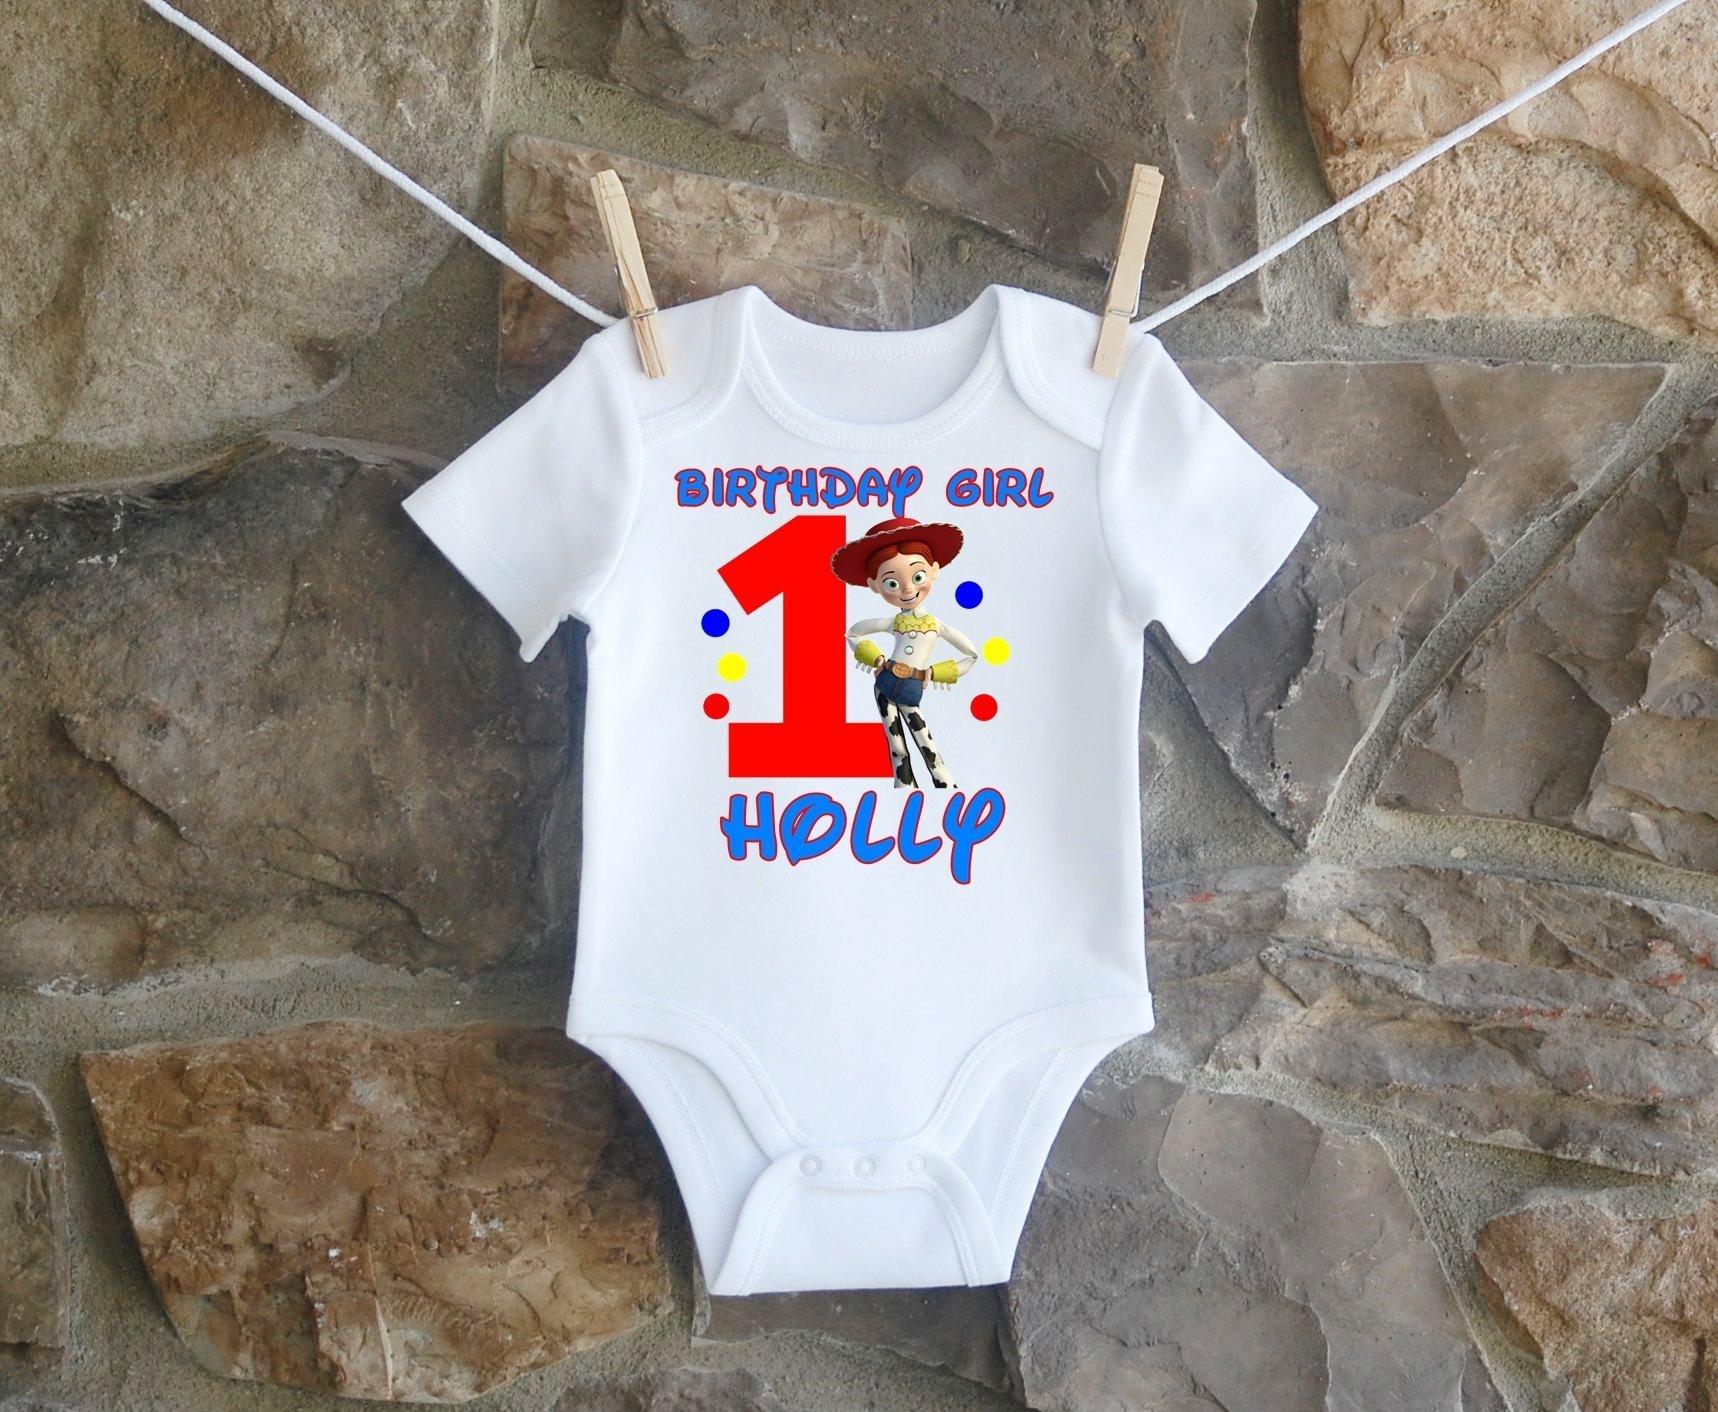 Jesse Birthday Shirt, Jesse Birthday Shirt For Girls, Personalized Girls Toy Story Jesse Birthday Shirt, Customized Toy Story Jesse Birthday Shirt